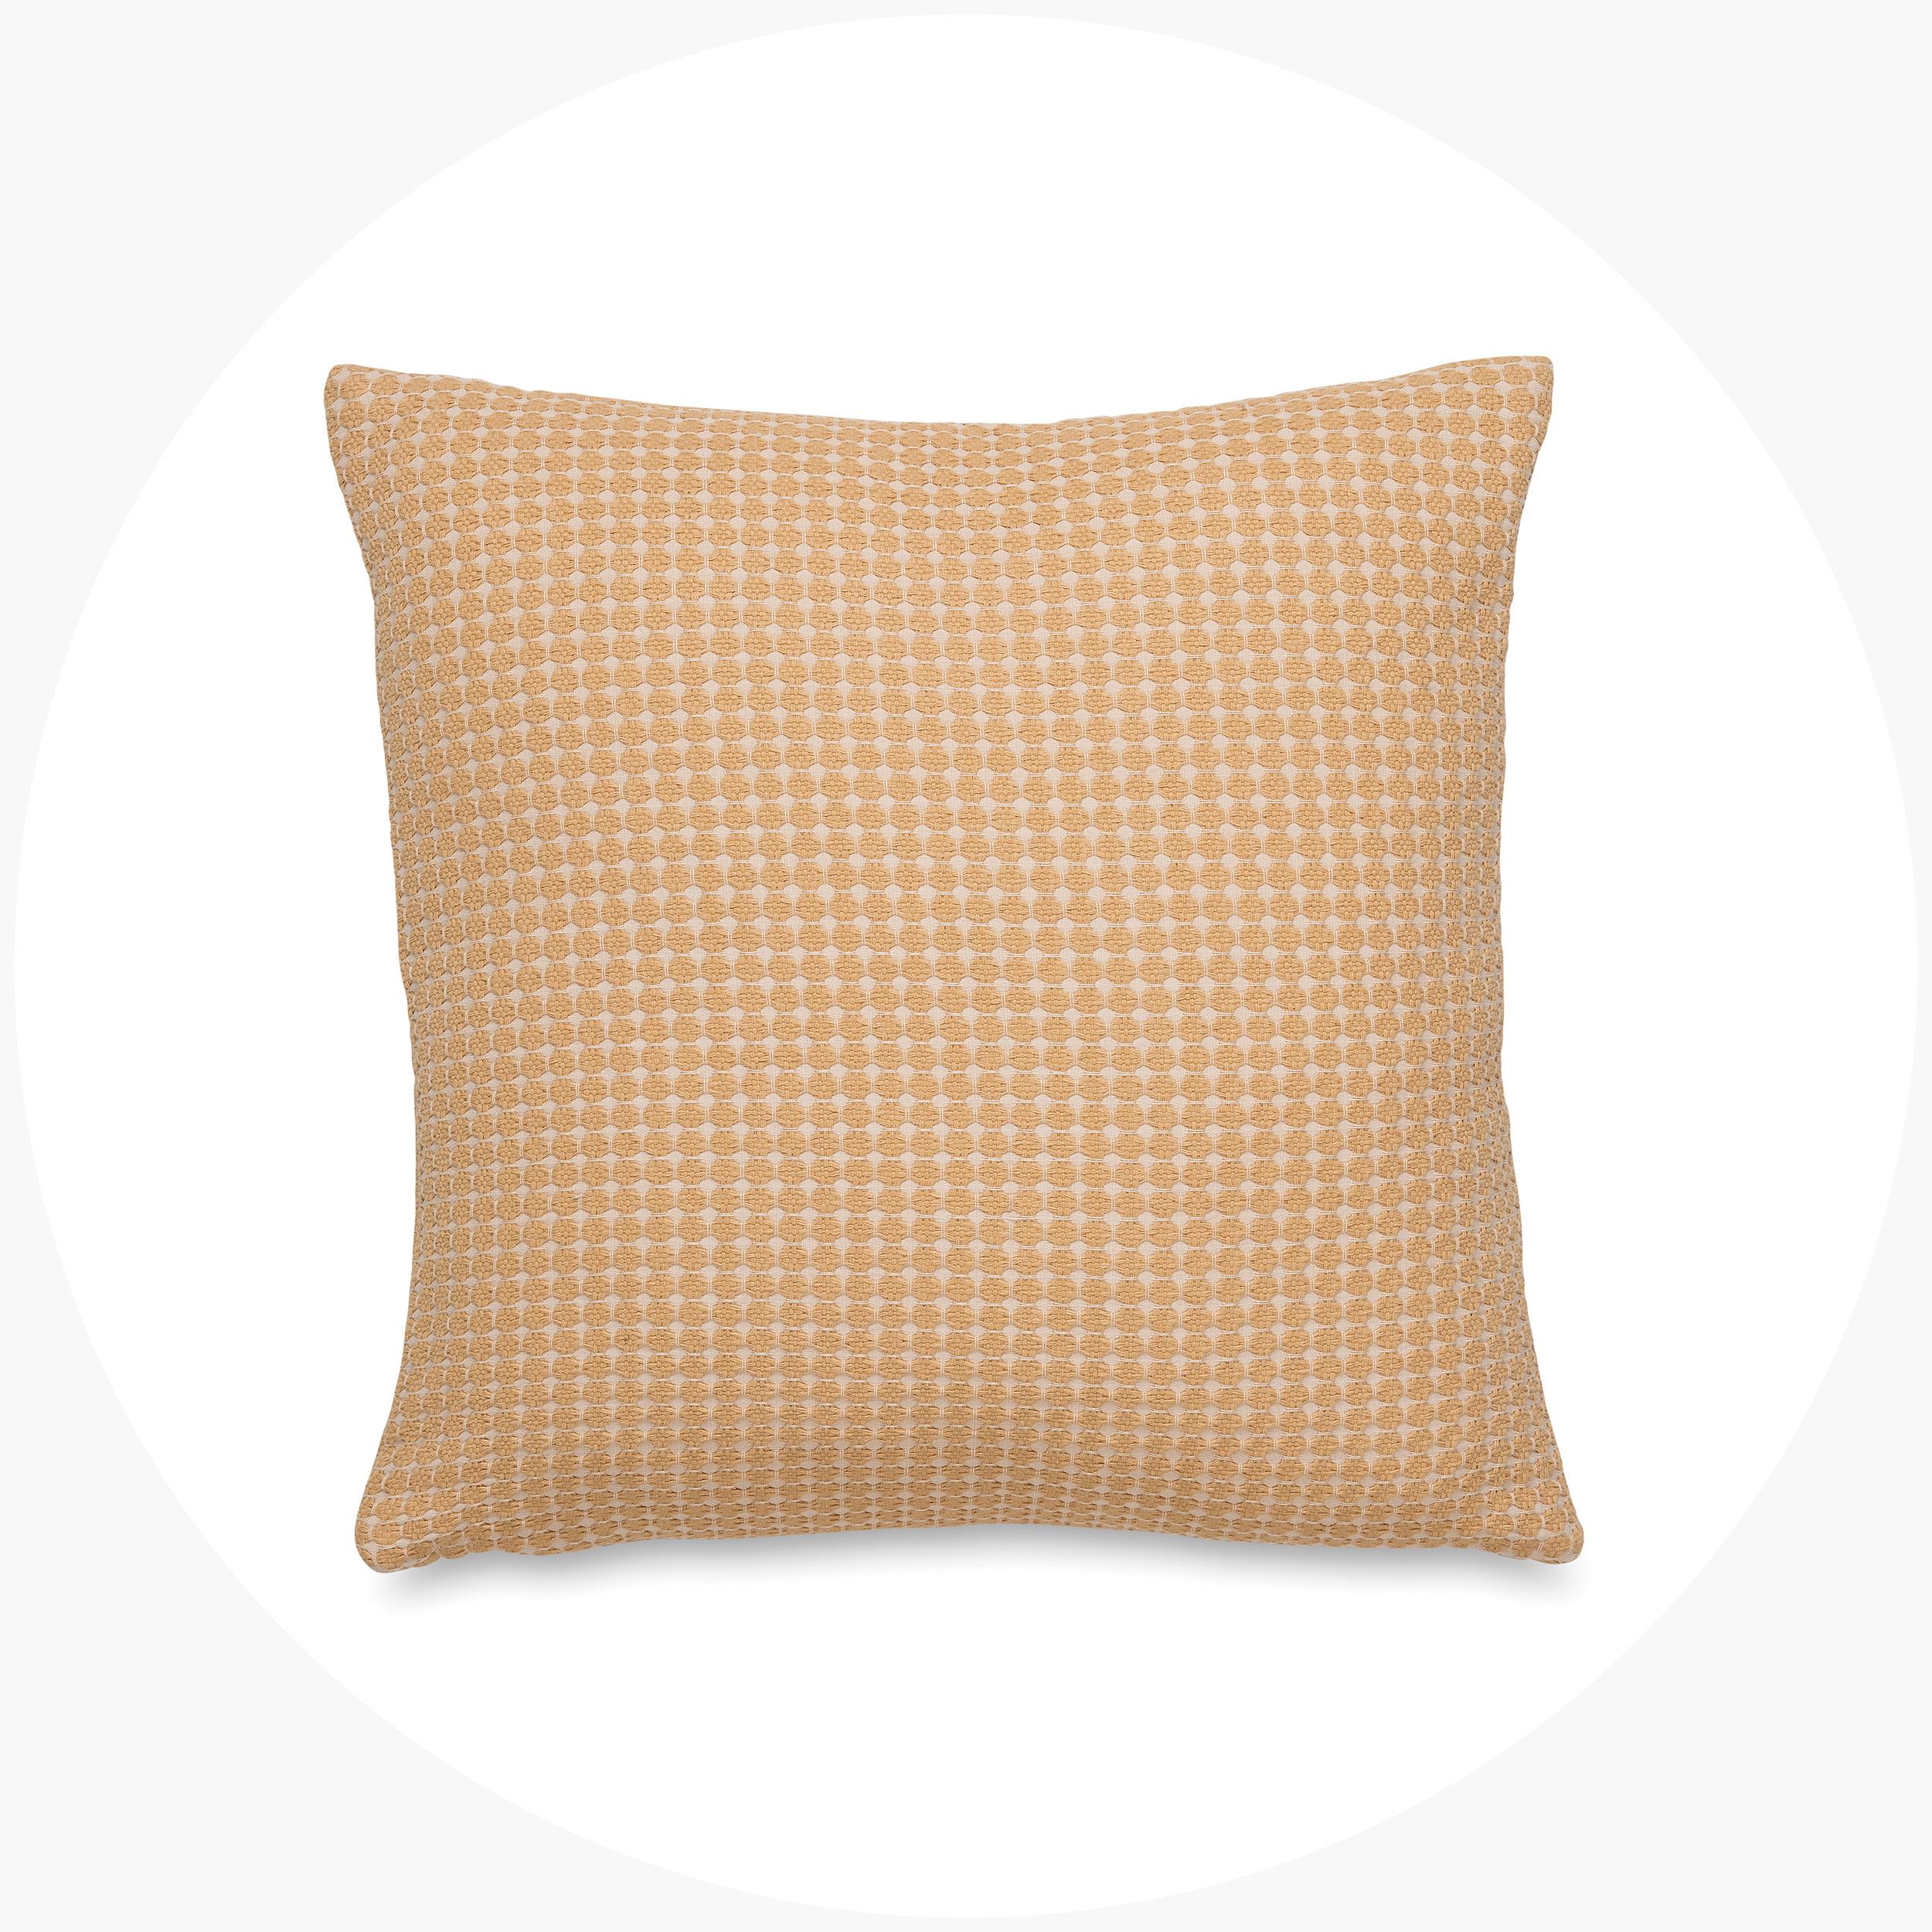 Adler Woven Cushion Cover  $79.90